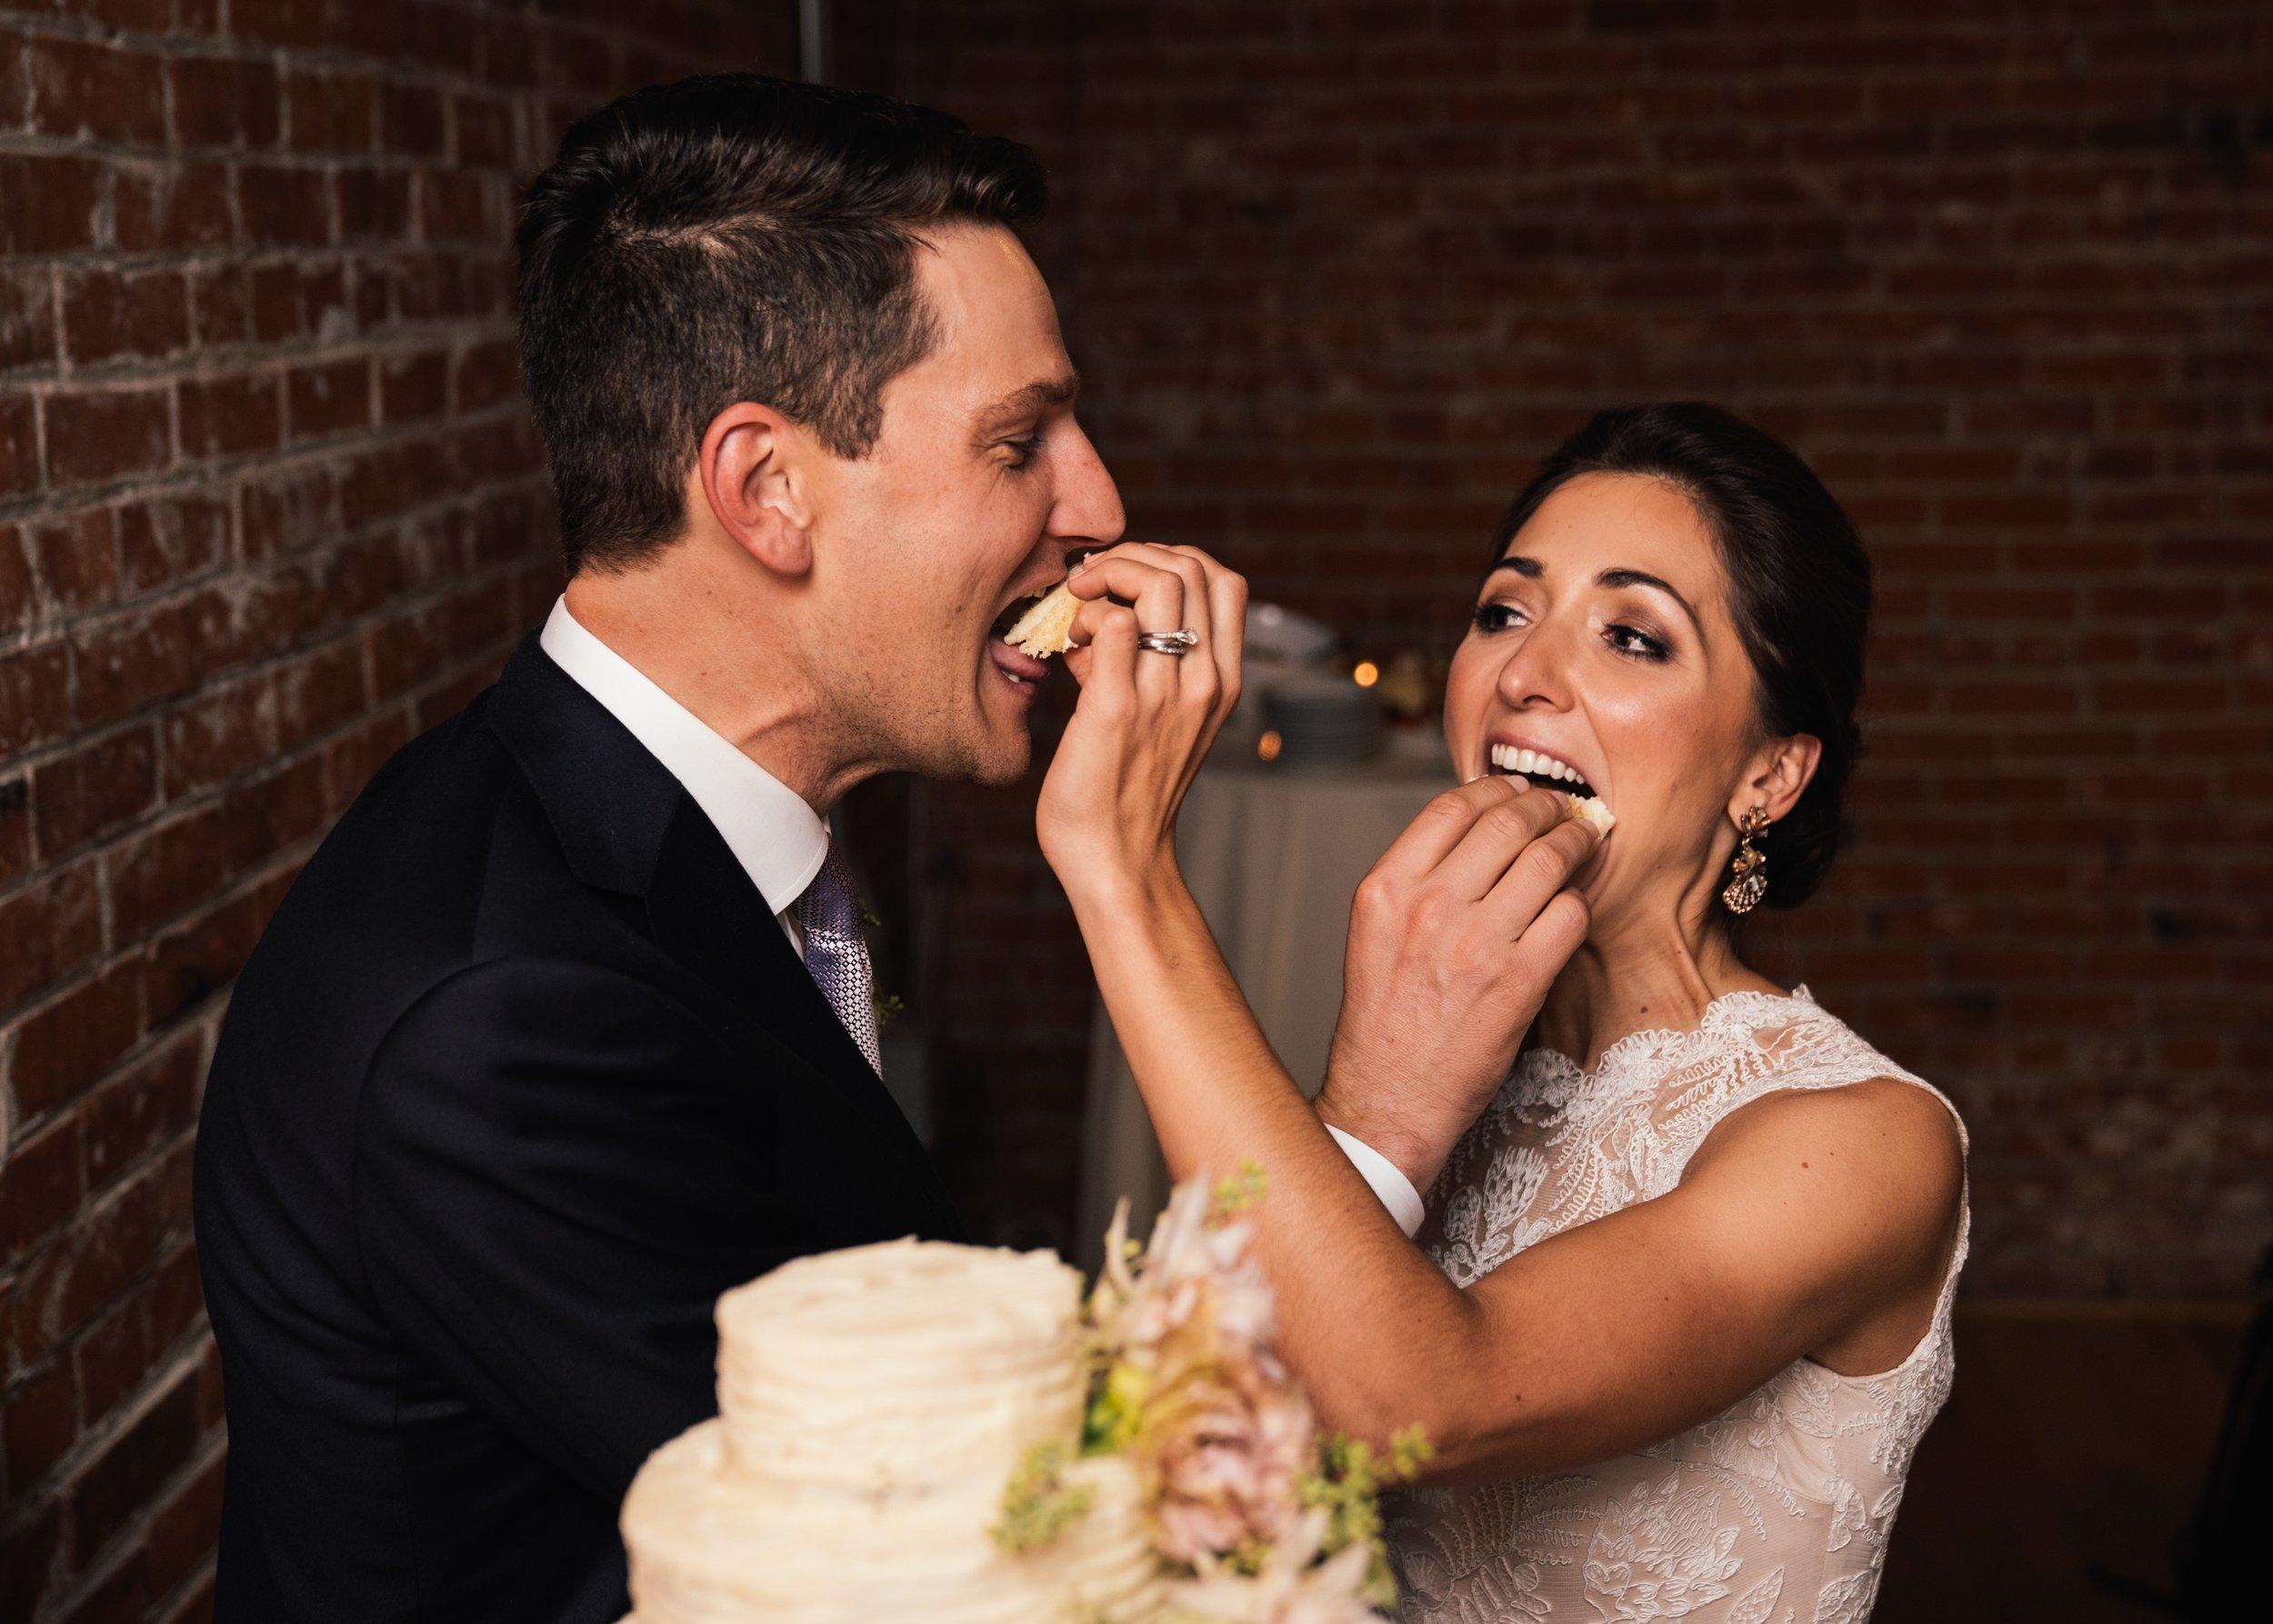 Bride and Groom Cake Cutting at BMoCA